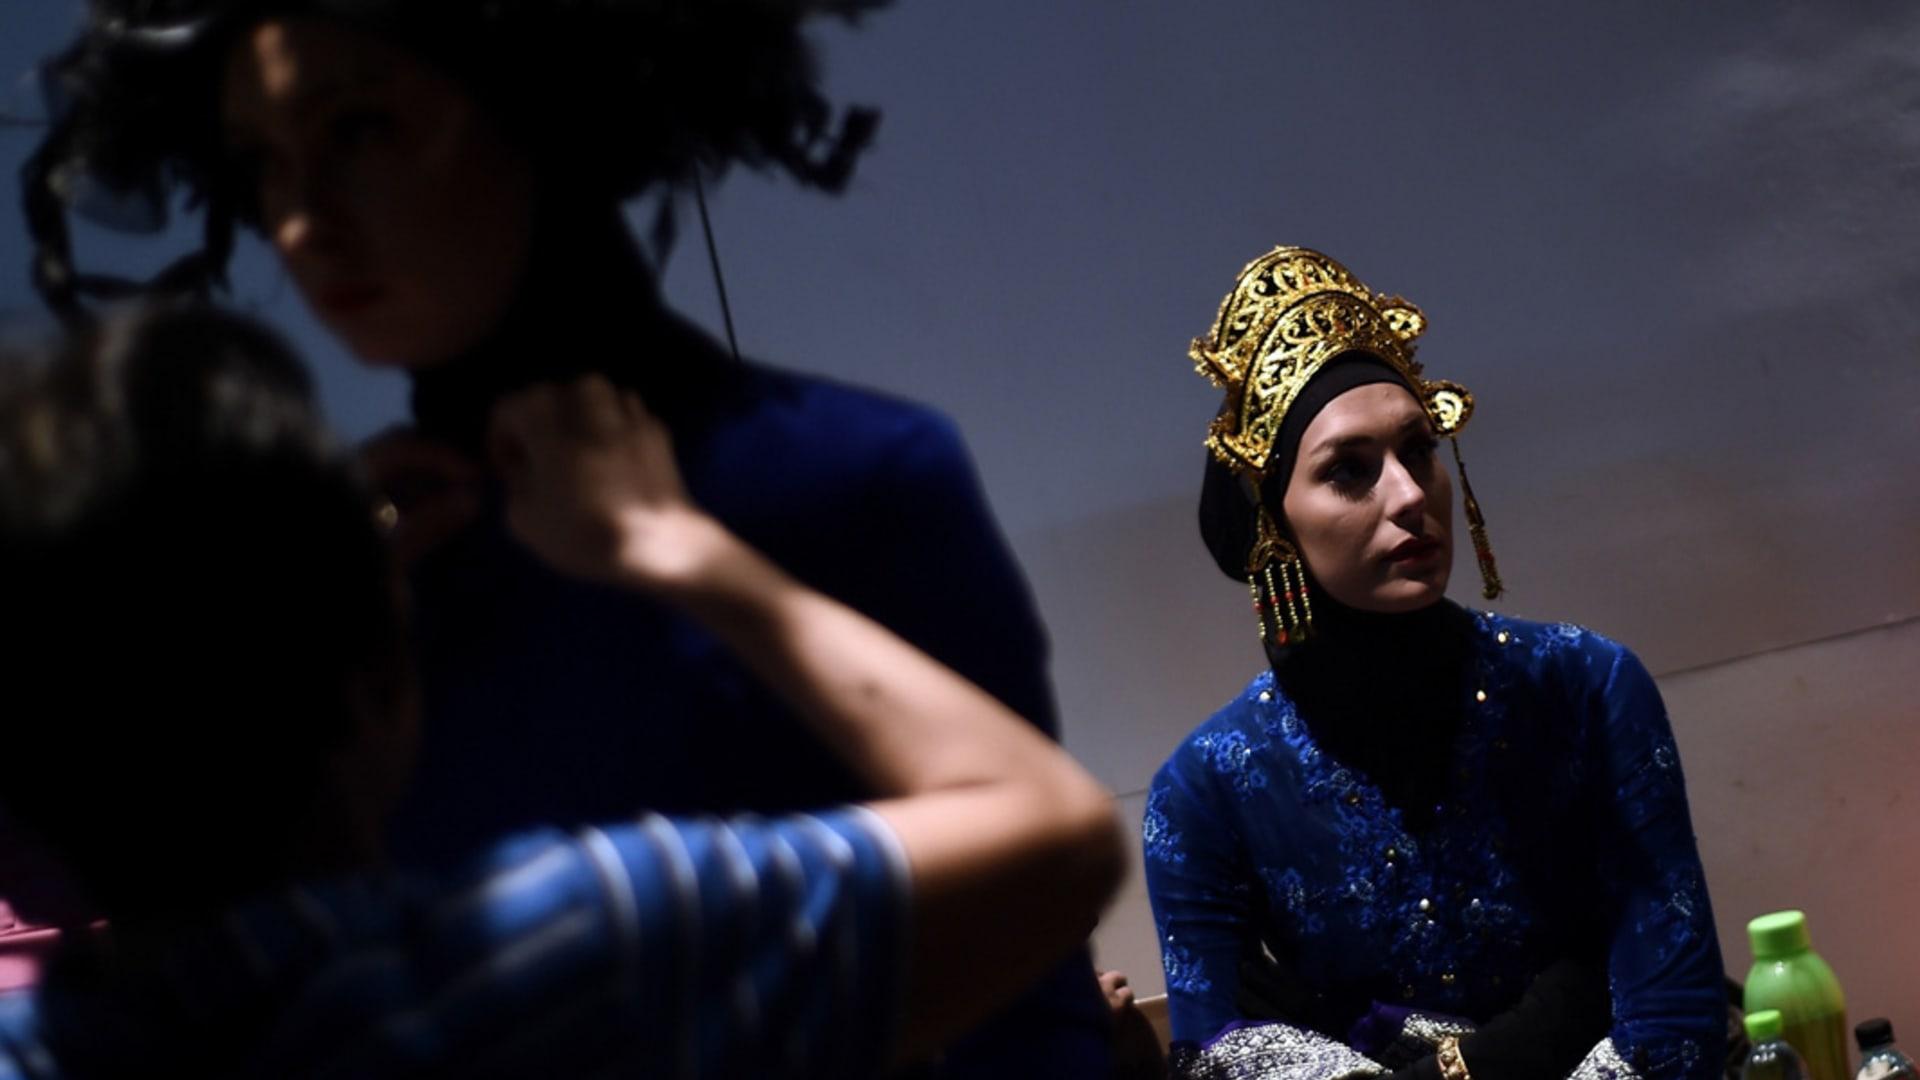 19fb78eef بالصور..أزياء إسلامية بألوان زاهية في كوالالمبور - CNN Arabic